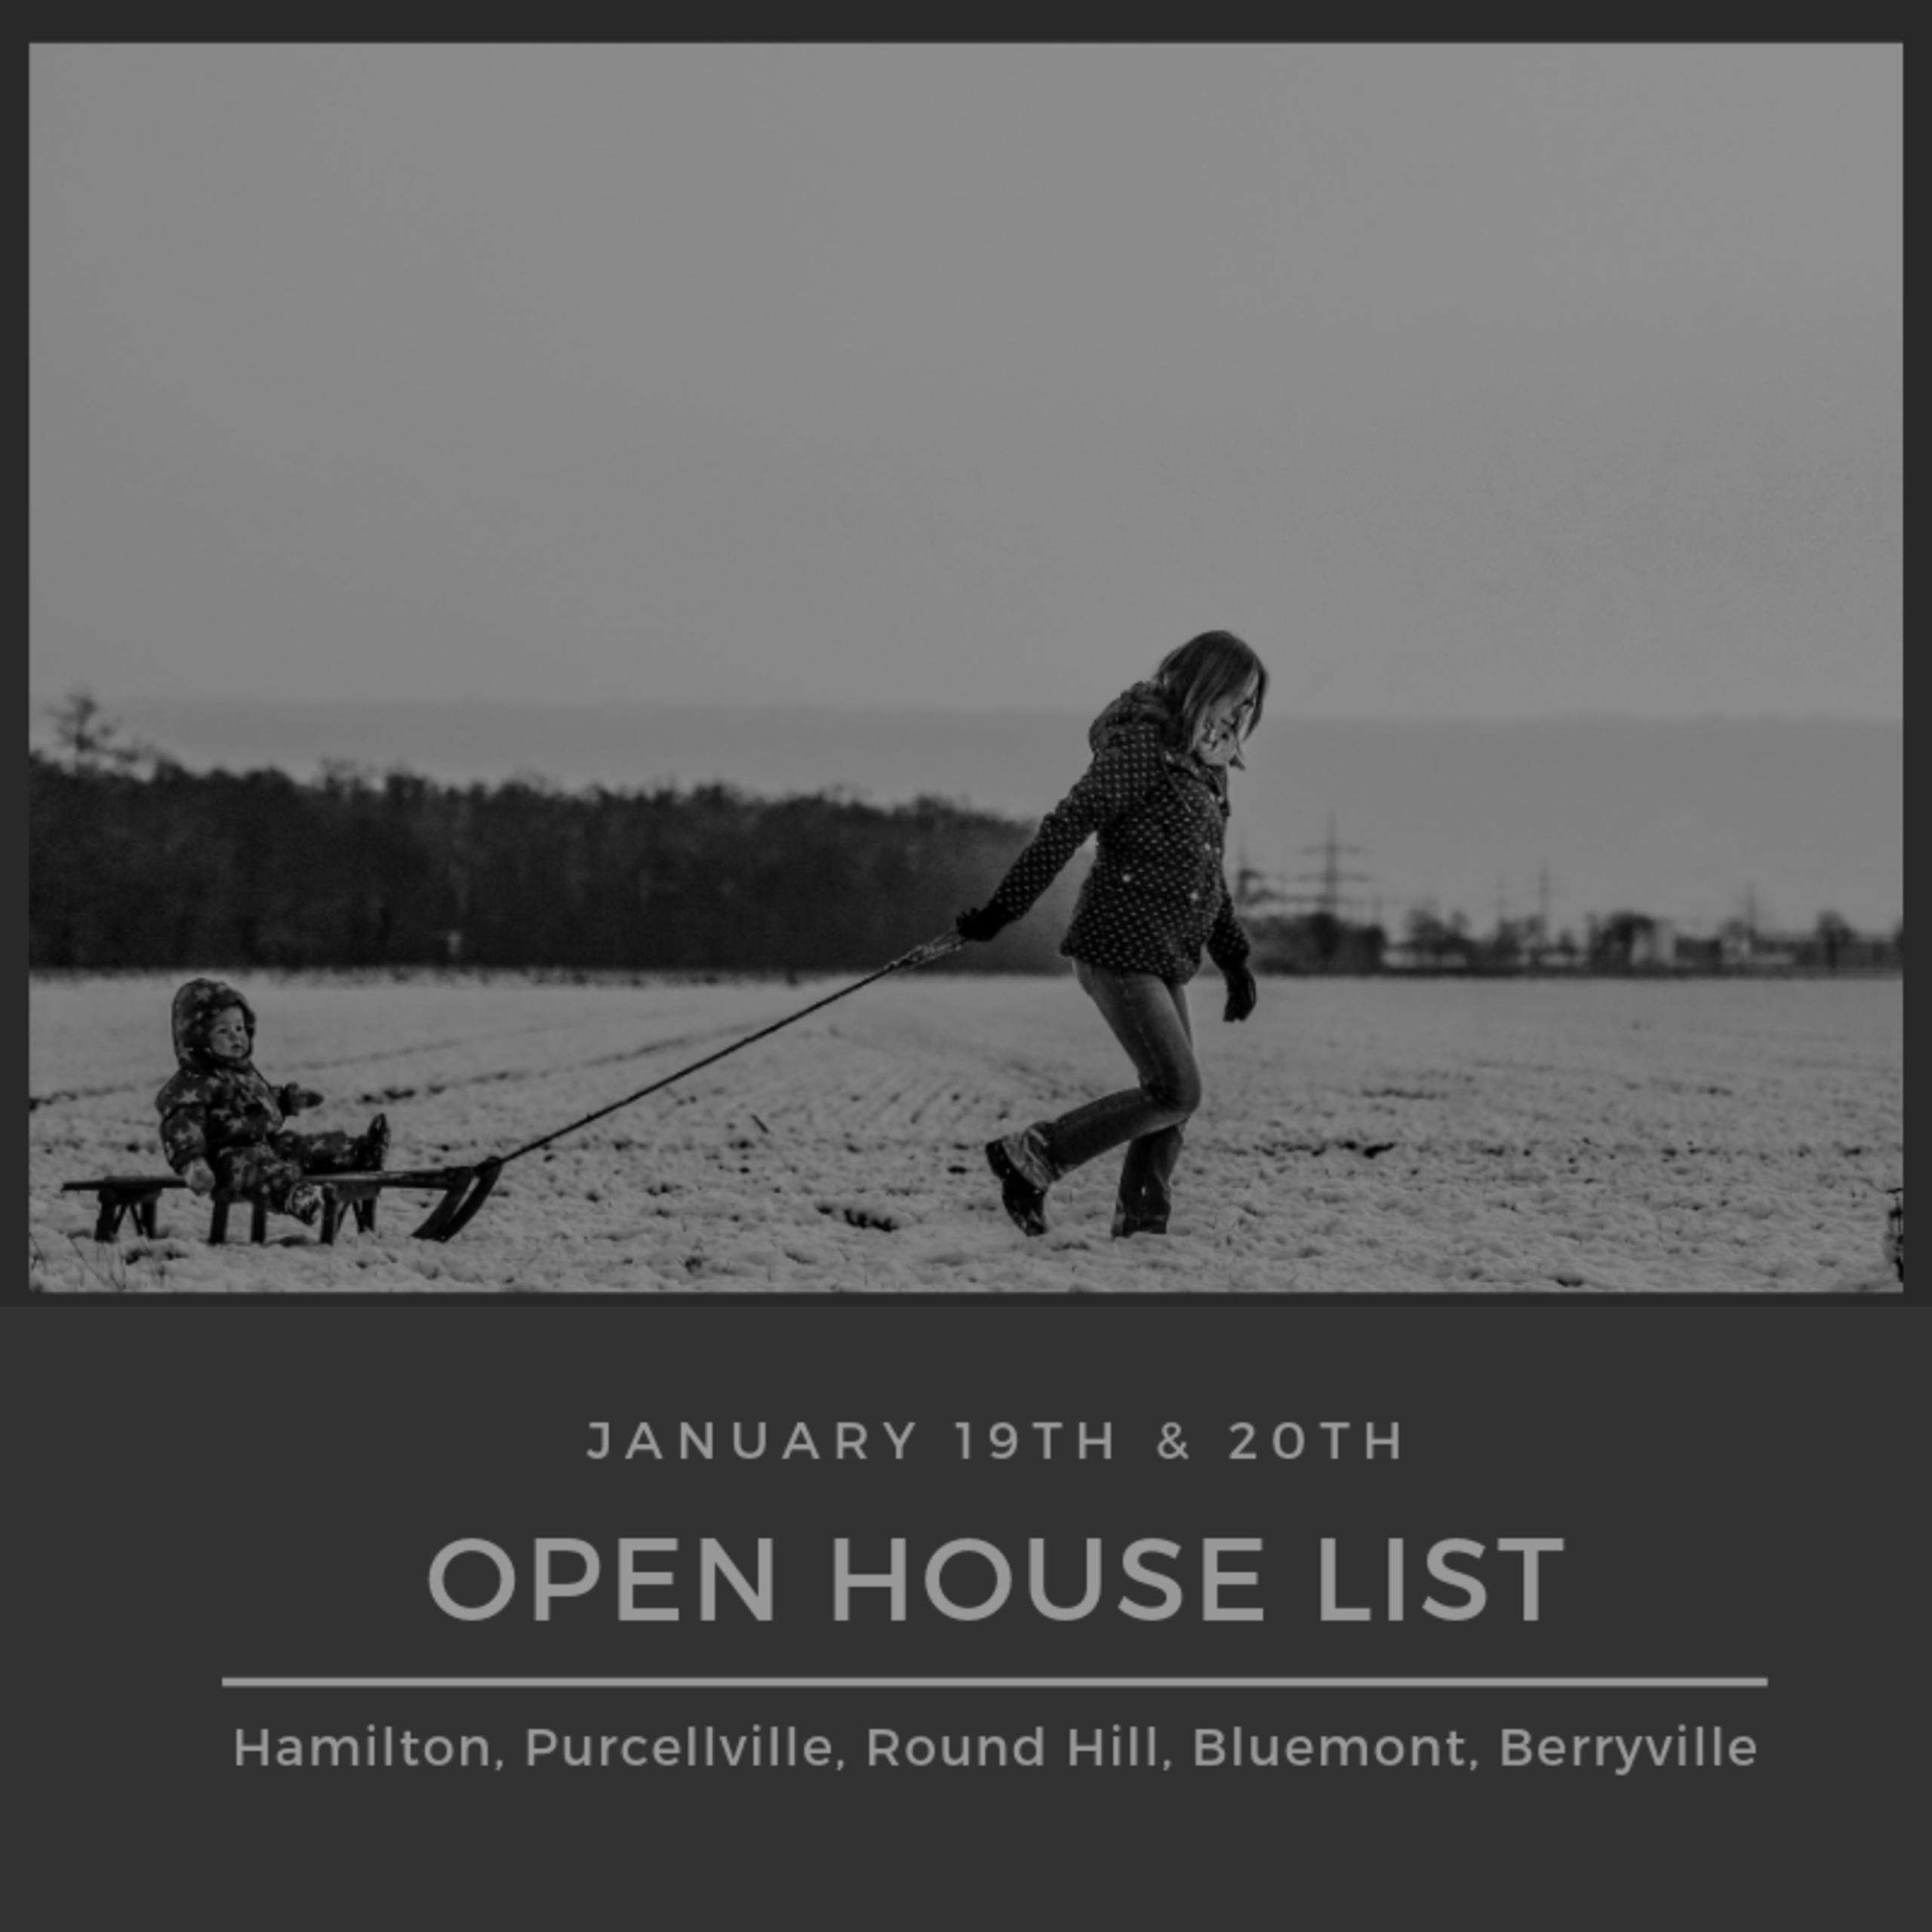 Open House List 1/19/19 – 1/20/19